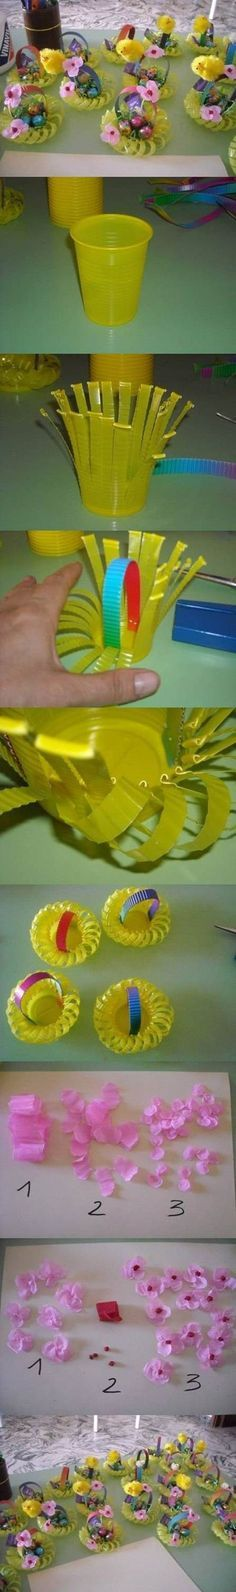 DIY Plastic Cup Easter Basket | iCreativeIdeas.com Follow Us on Facebook --> https://www.facebook.com/iCreativeIdeas